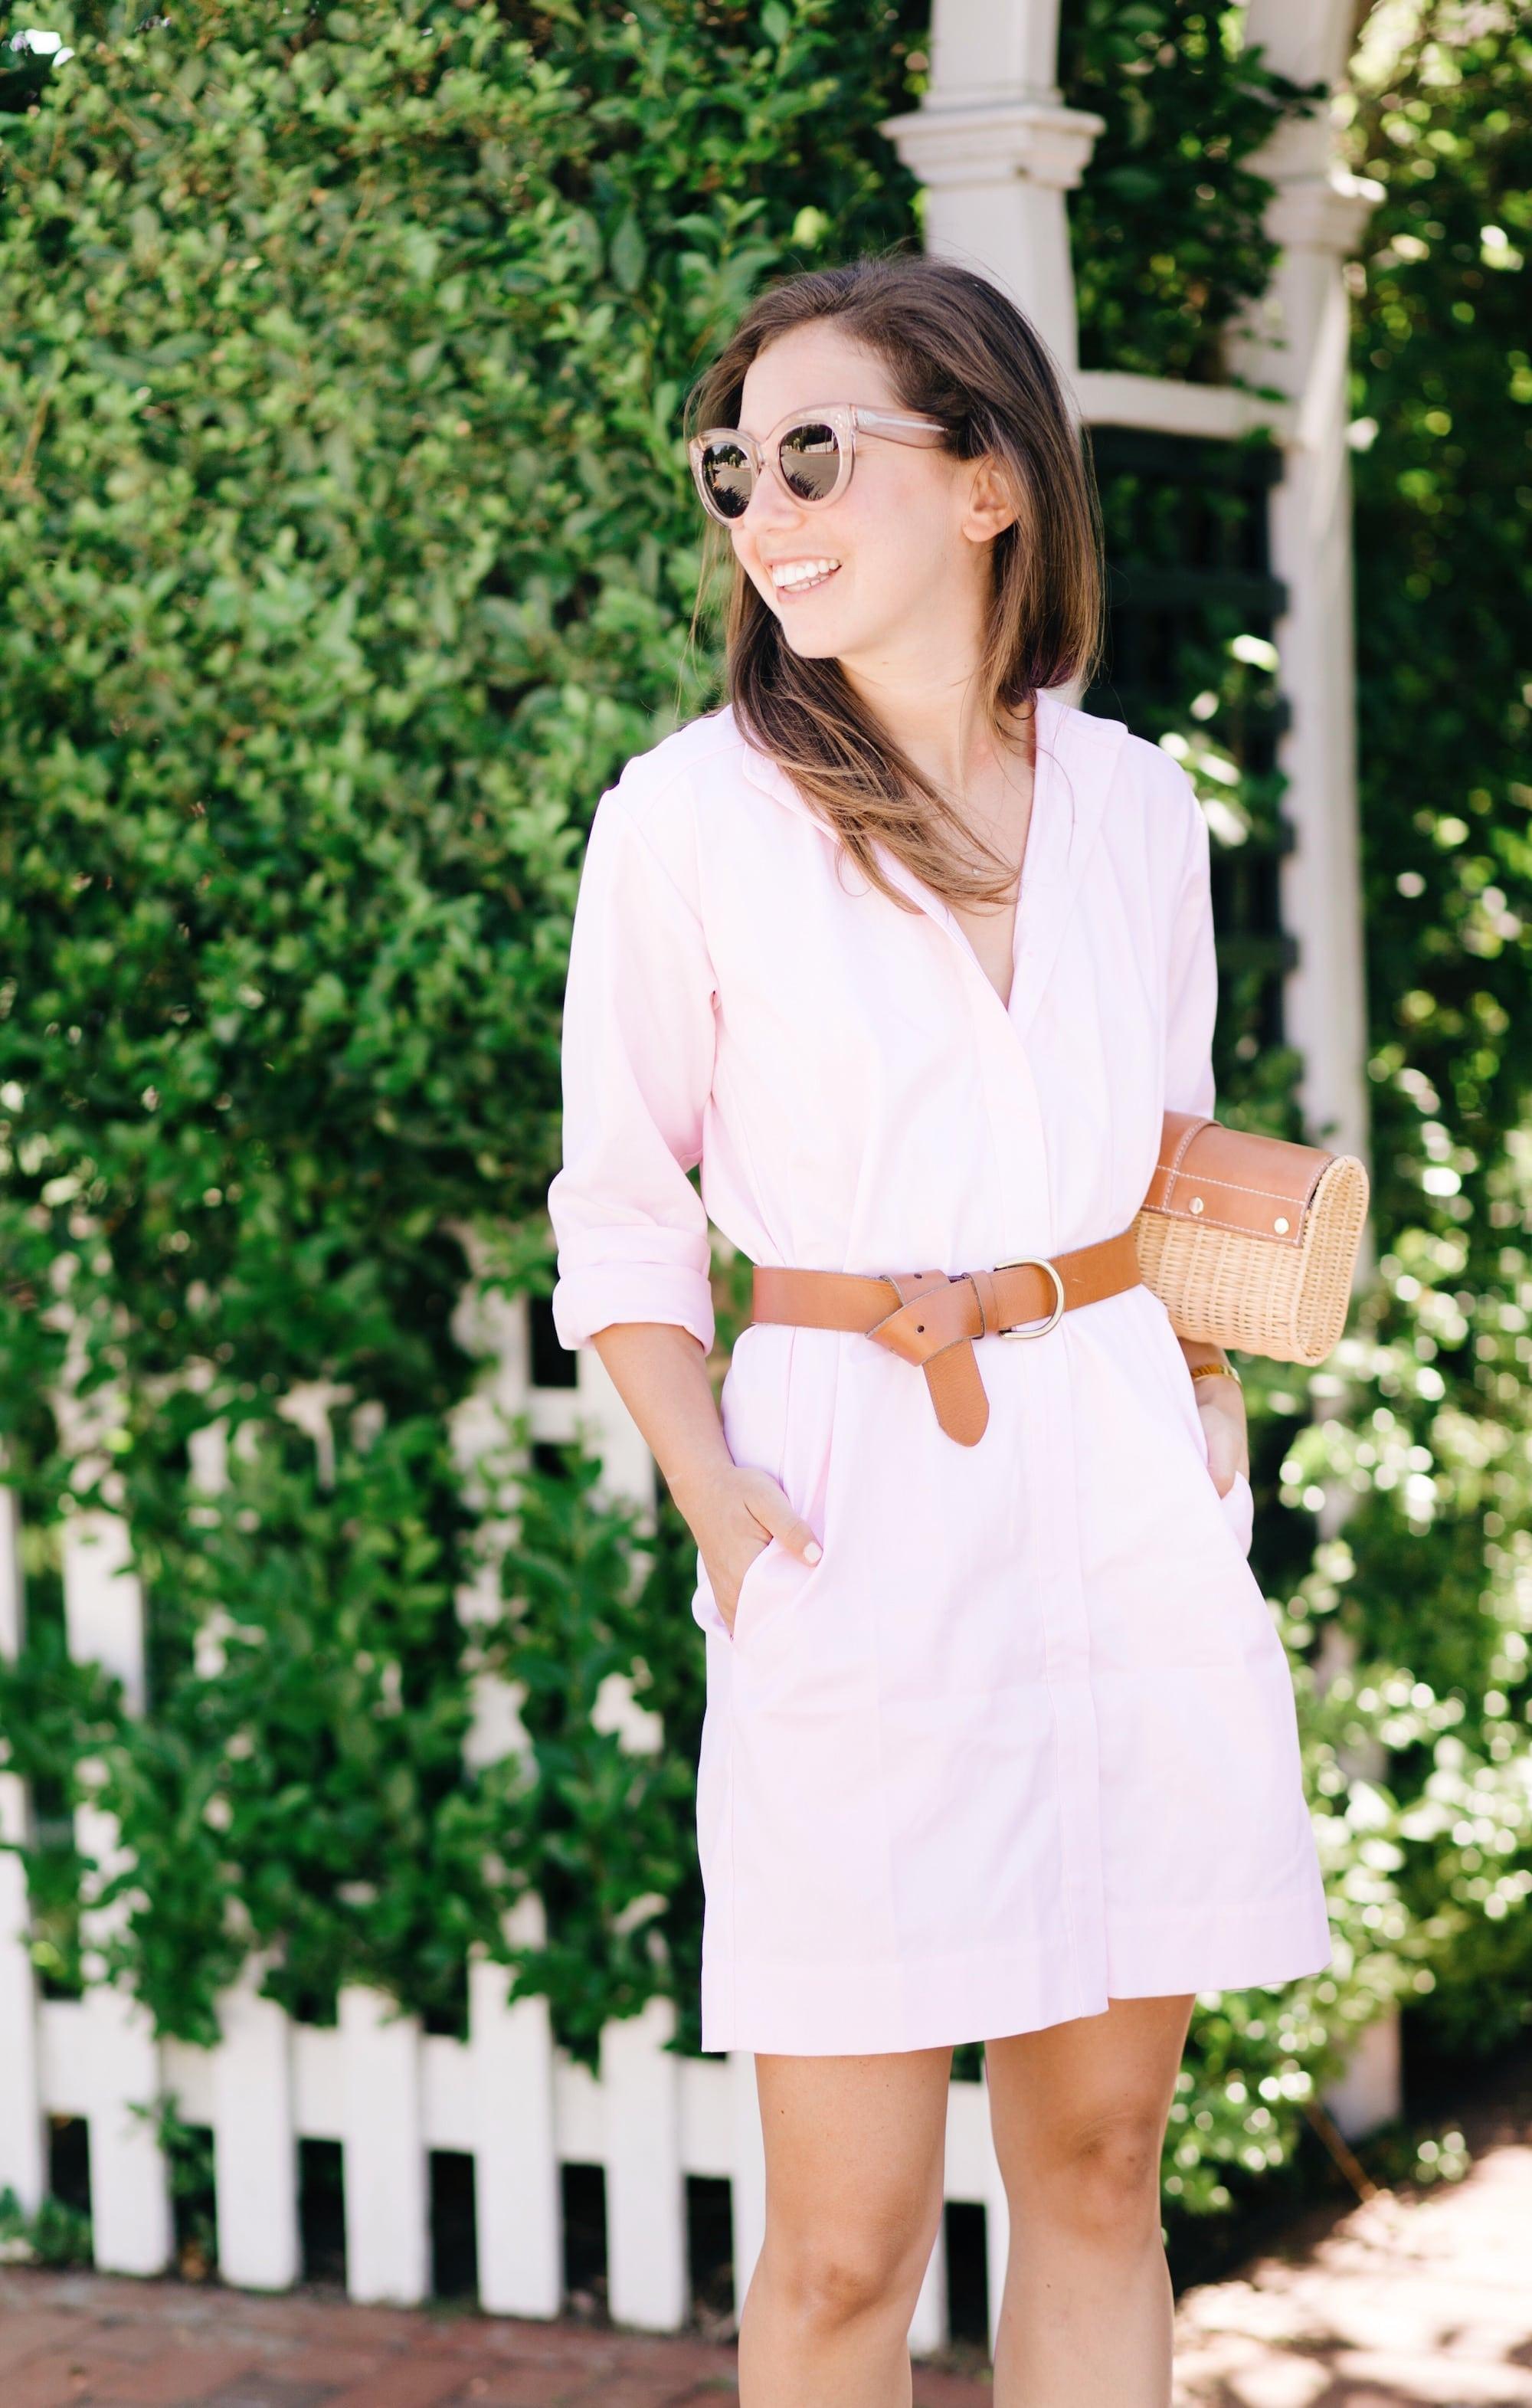 Micaela Meyer shirtdress with belt